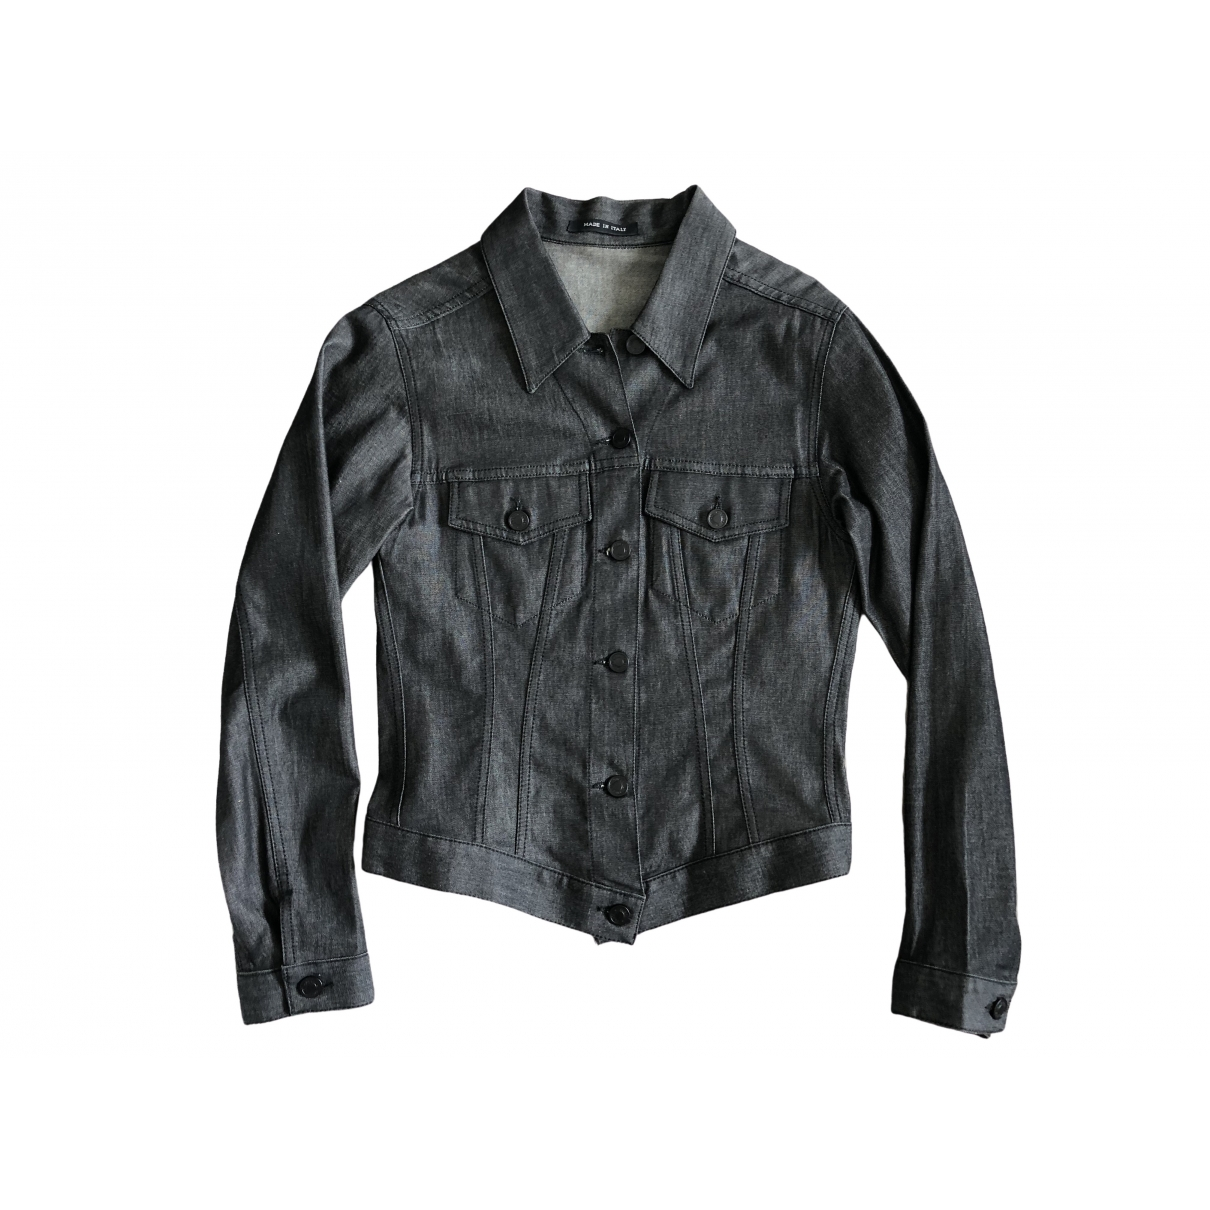 Gucci \N Jacke in  Schwarz Denim - Jeans